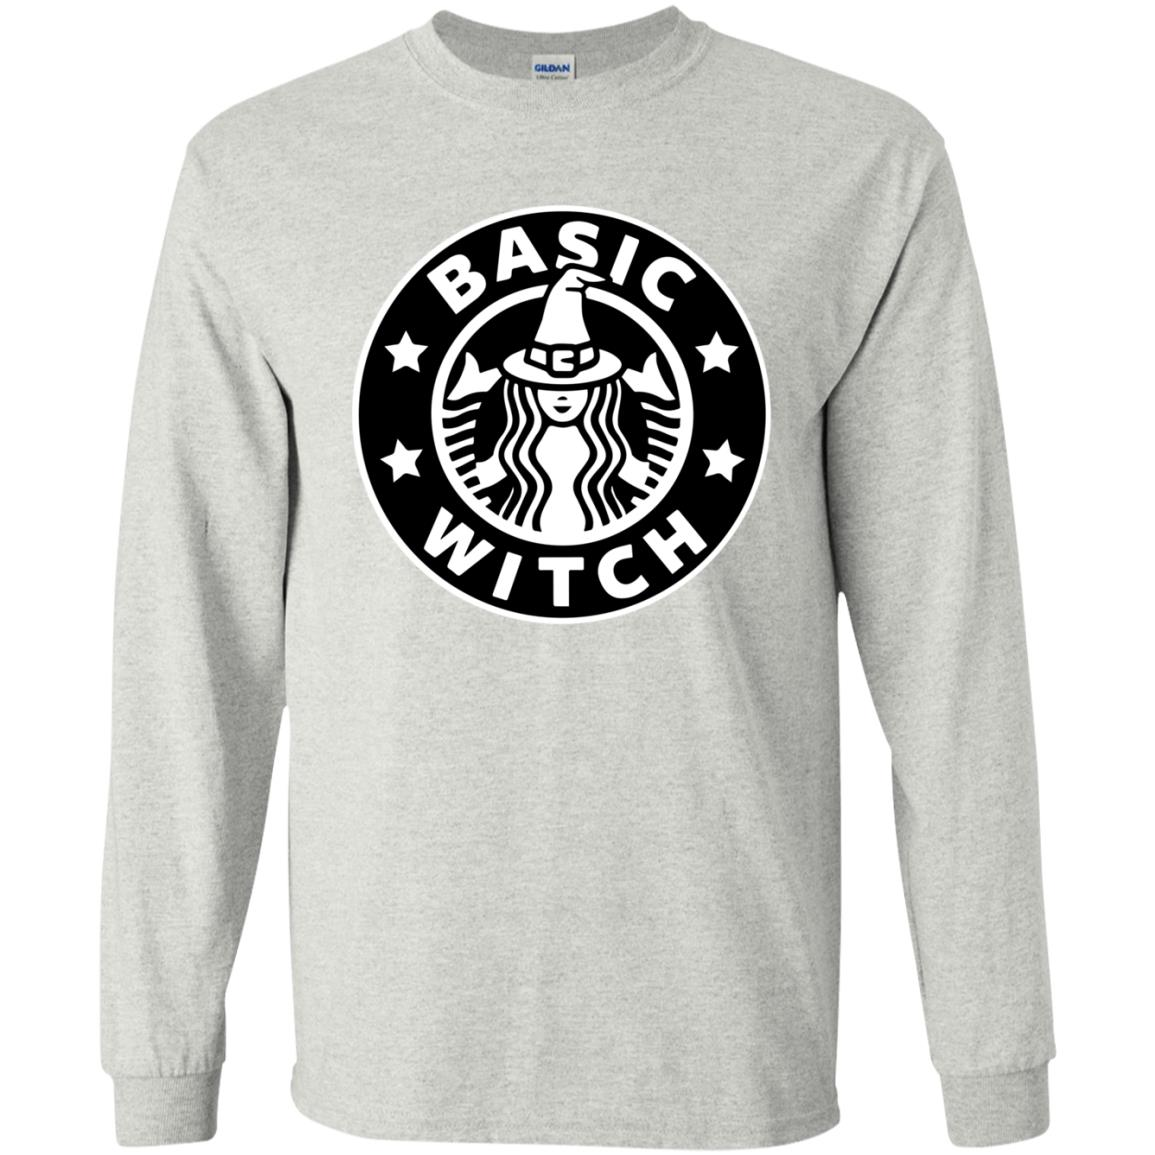 image 1016 - Basic Witch Shirt, Halloween Starbuck parody